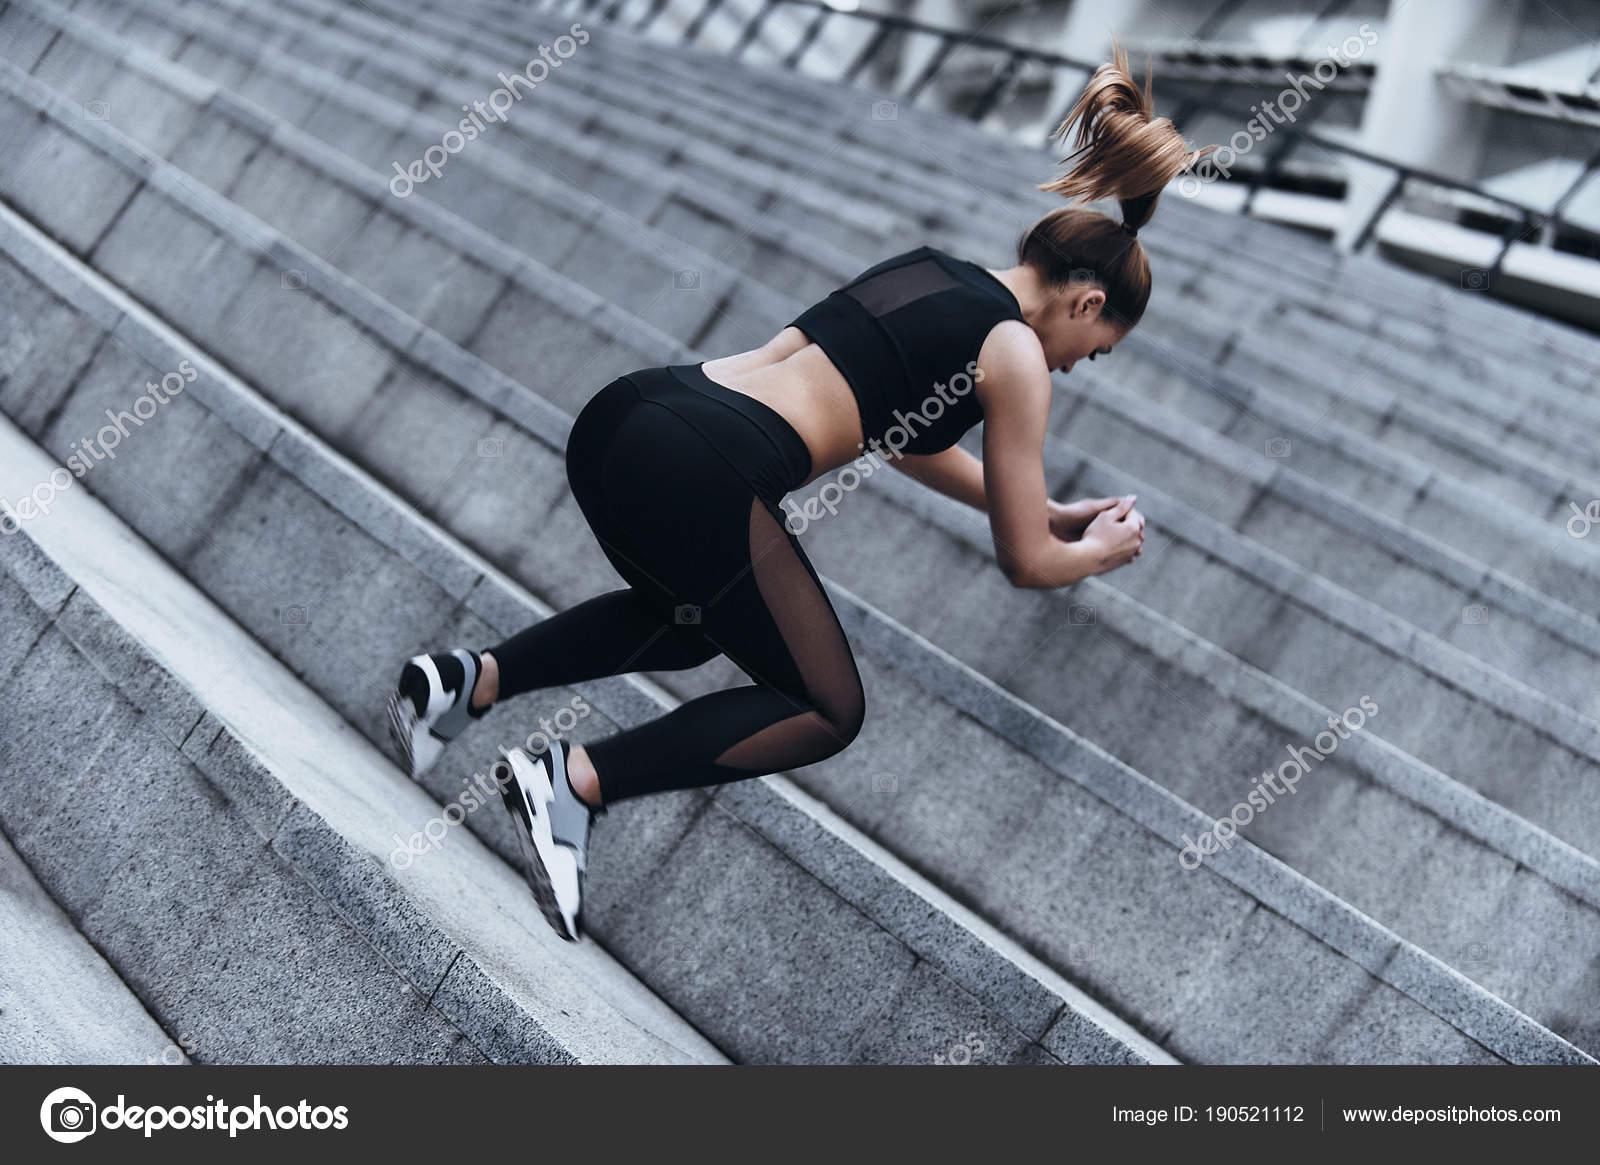 buy popular 5f2a8 d0600 Moderne Junge Frau Sportbekleidung Springen Beim Training ...